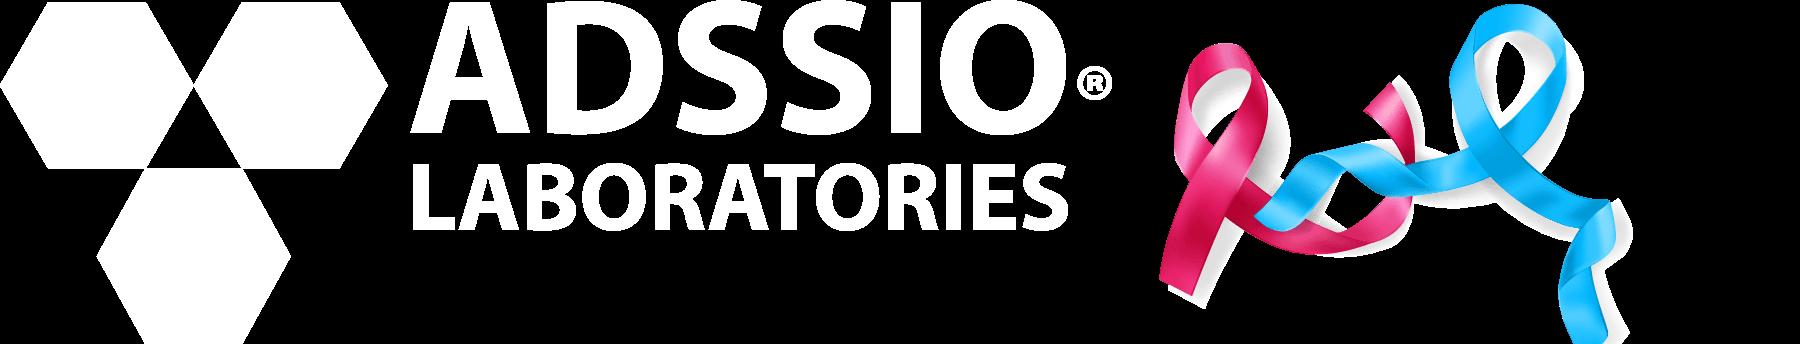 ADSSIO Laboratories